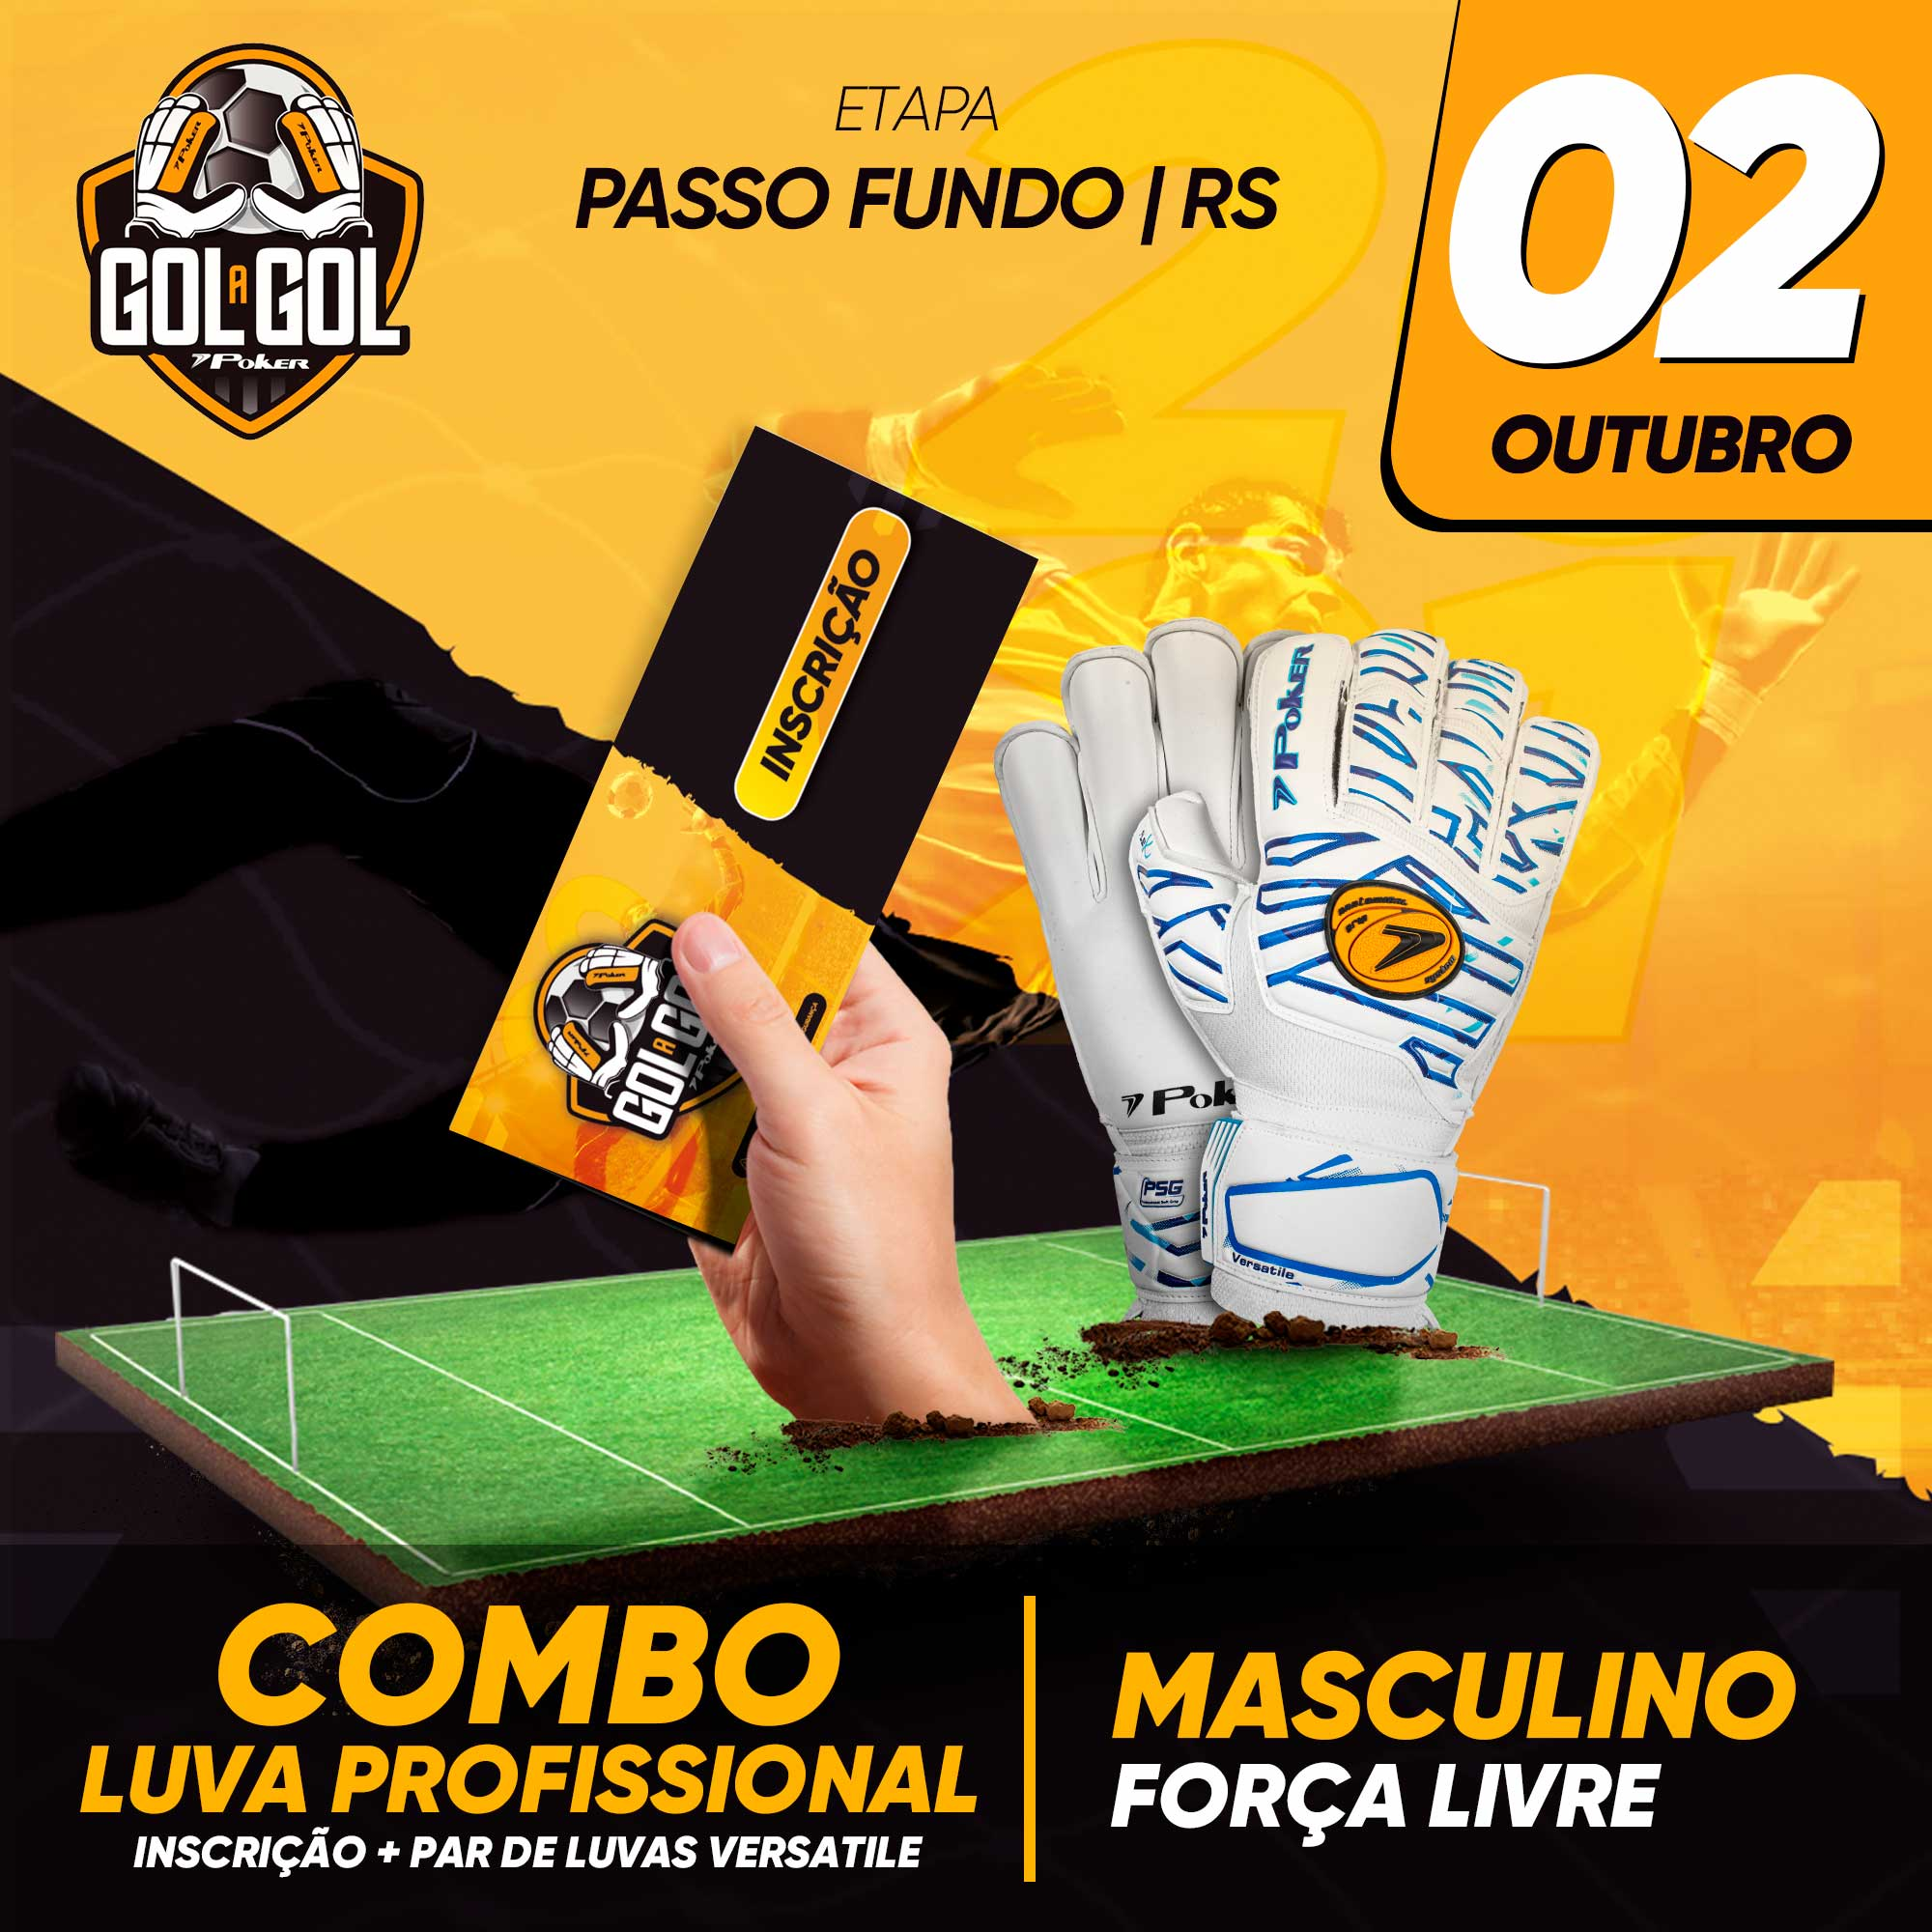 Combo Luva Profissional   Gol a Gol Passo Fundo/RS  02/10/2021